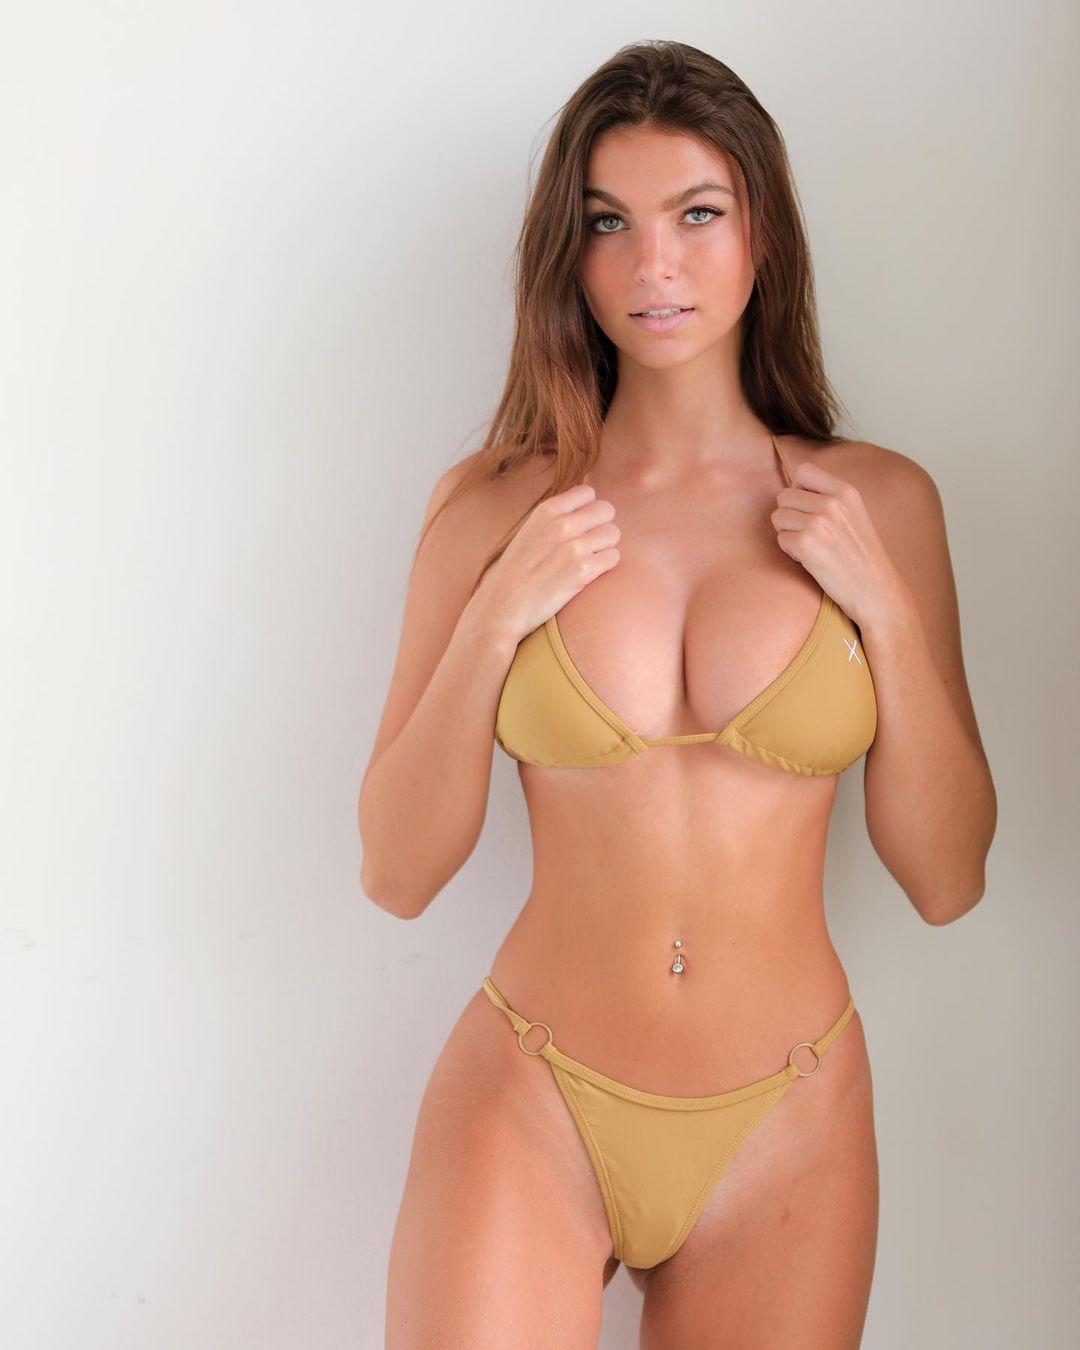 Grace Boor Nude Onlyfans Leaked 0001